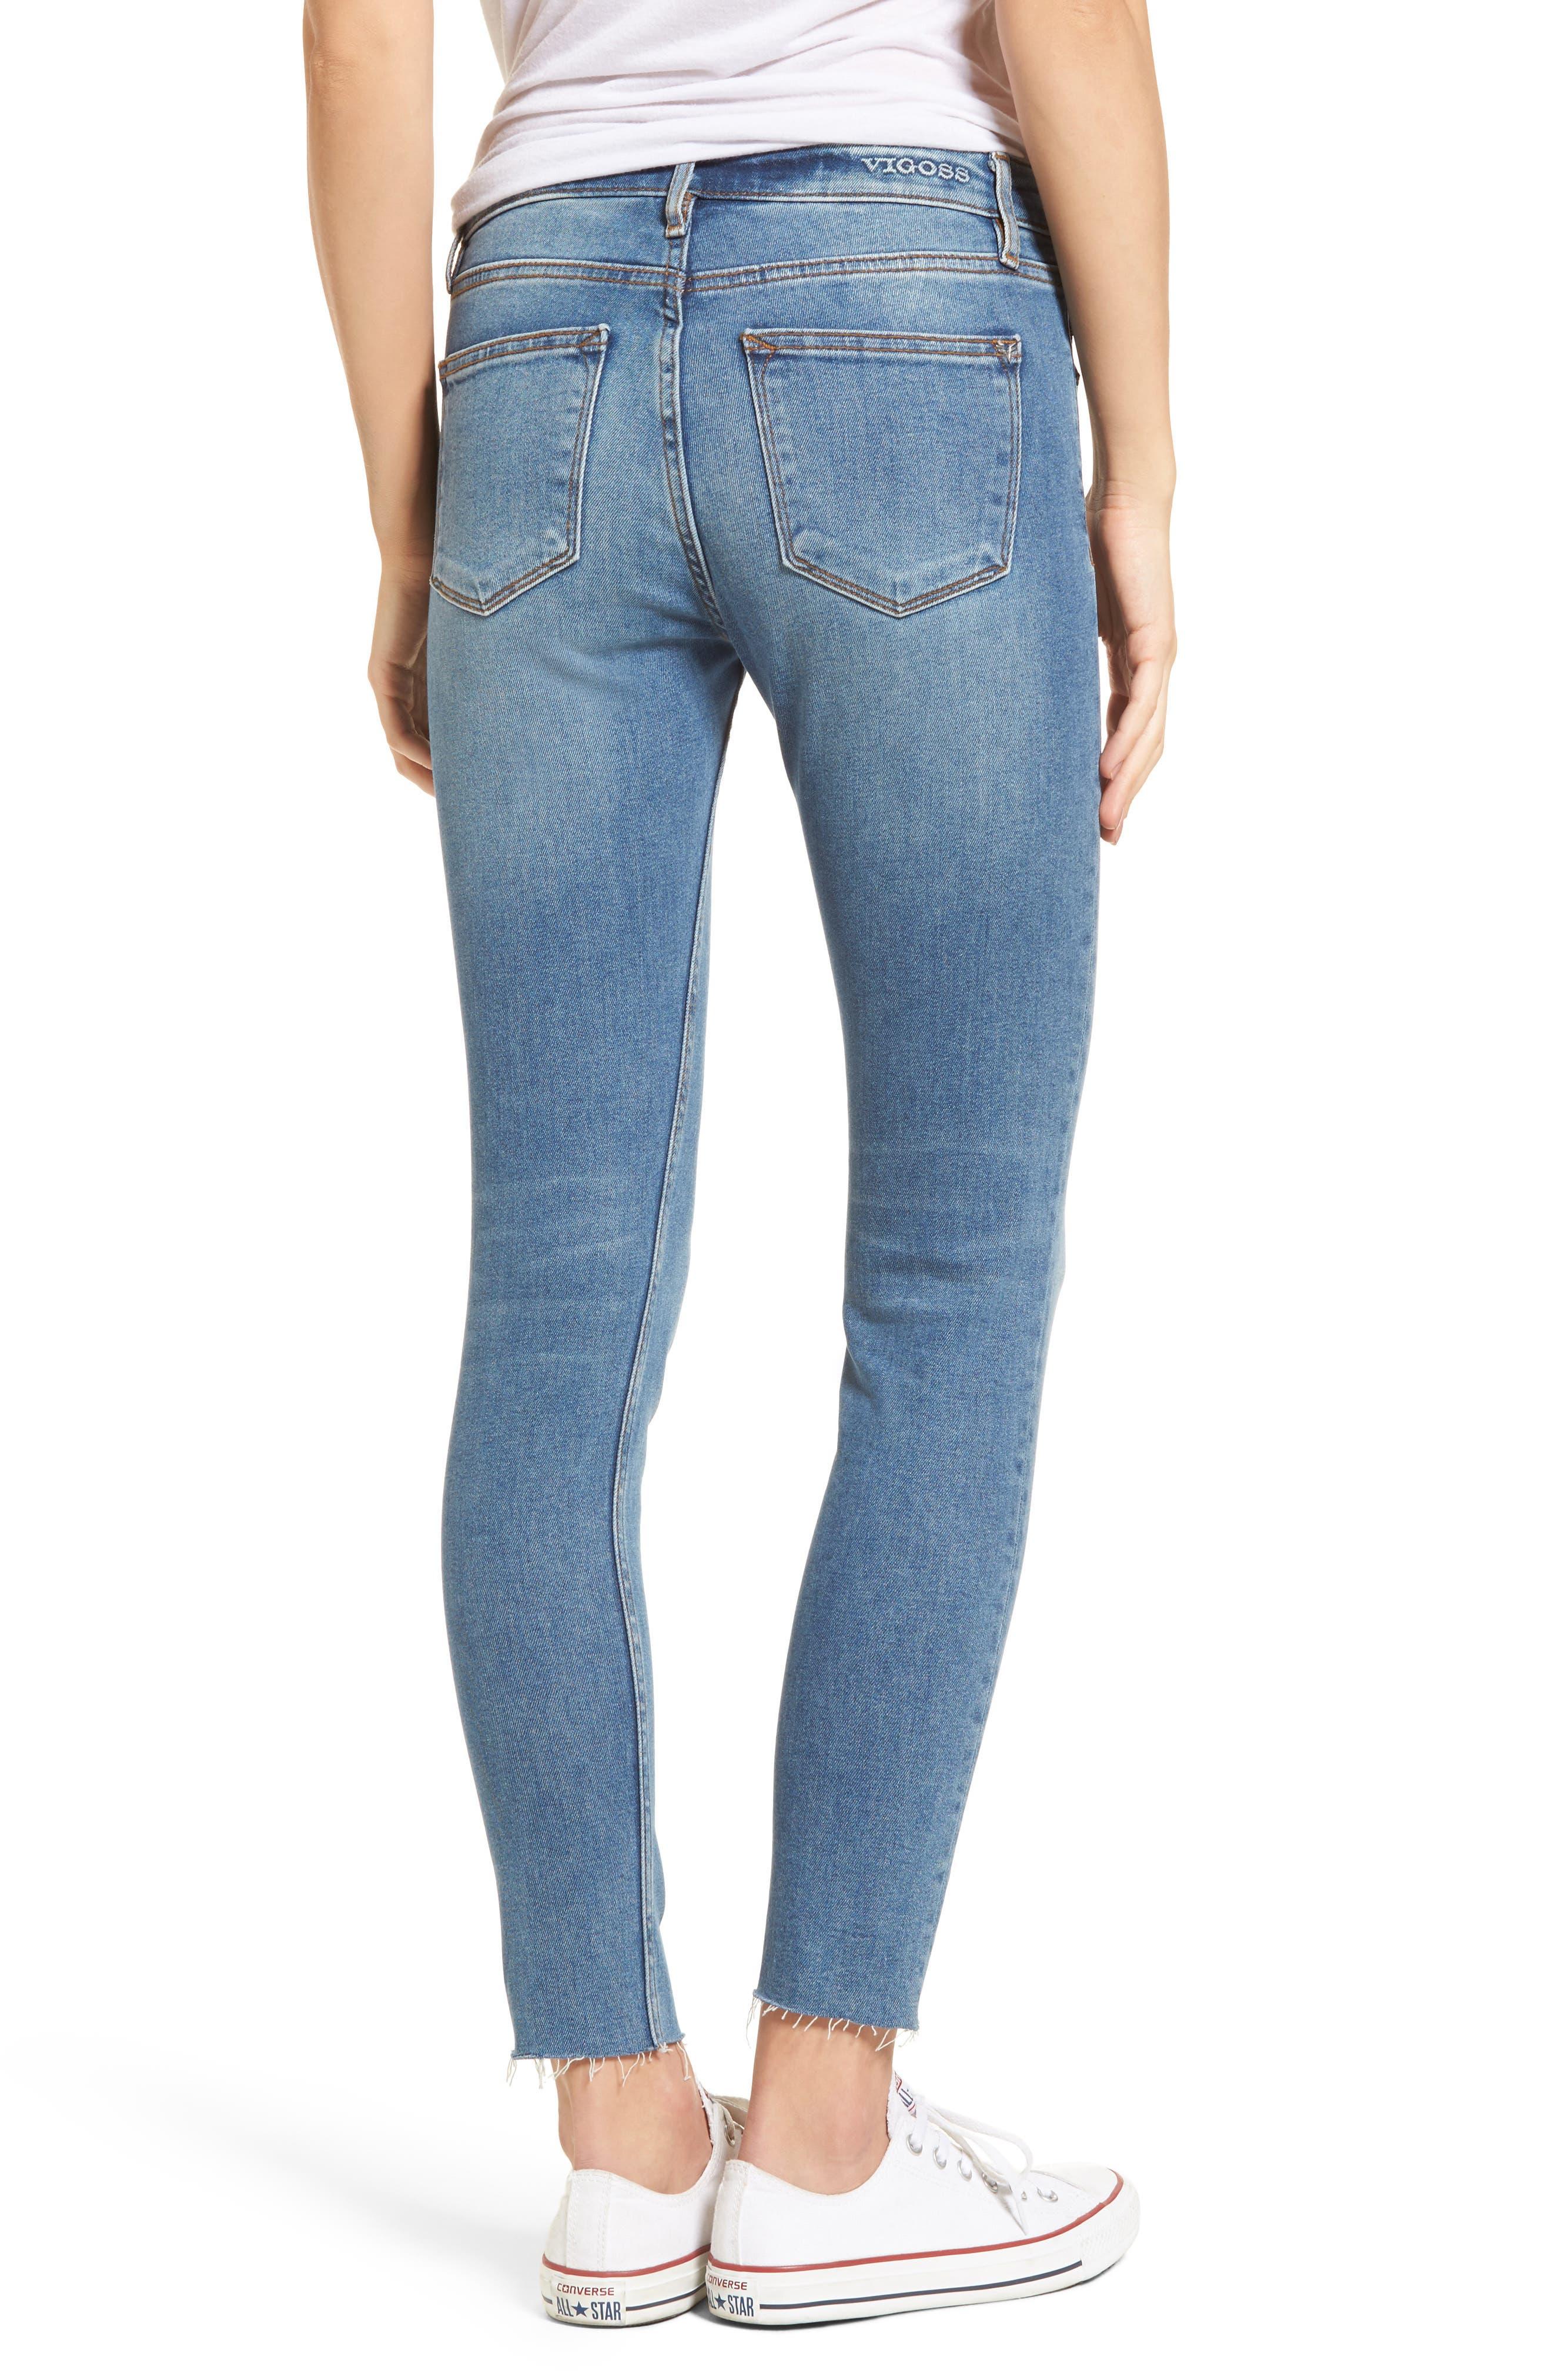 Marley Raw Hem Super Skinny Jeans,                             Alternate thumbnail 2, color,                             461